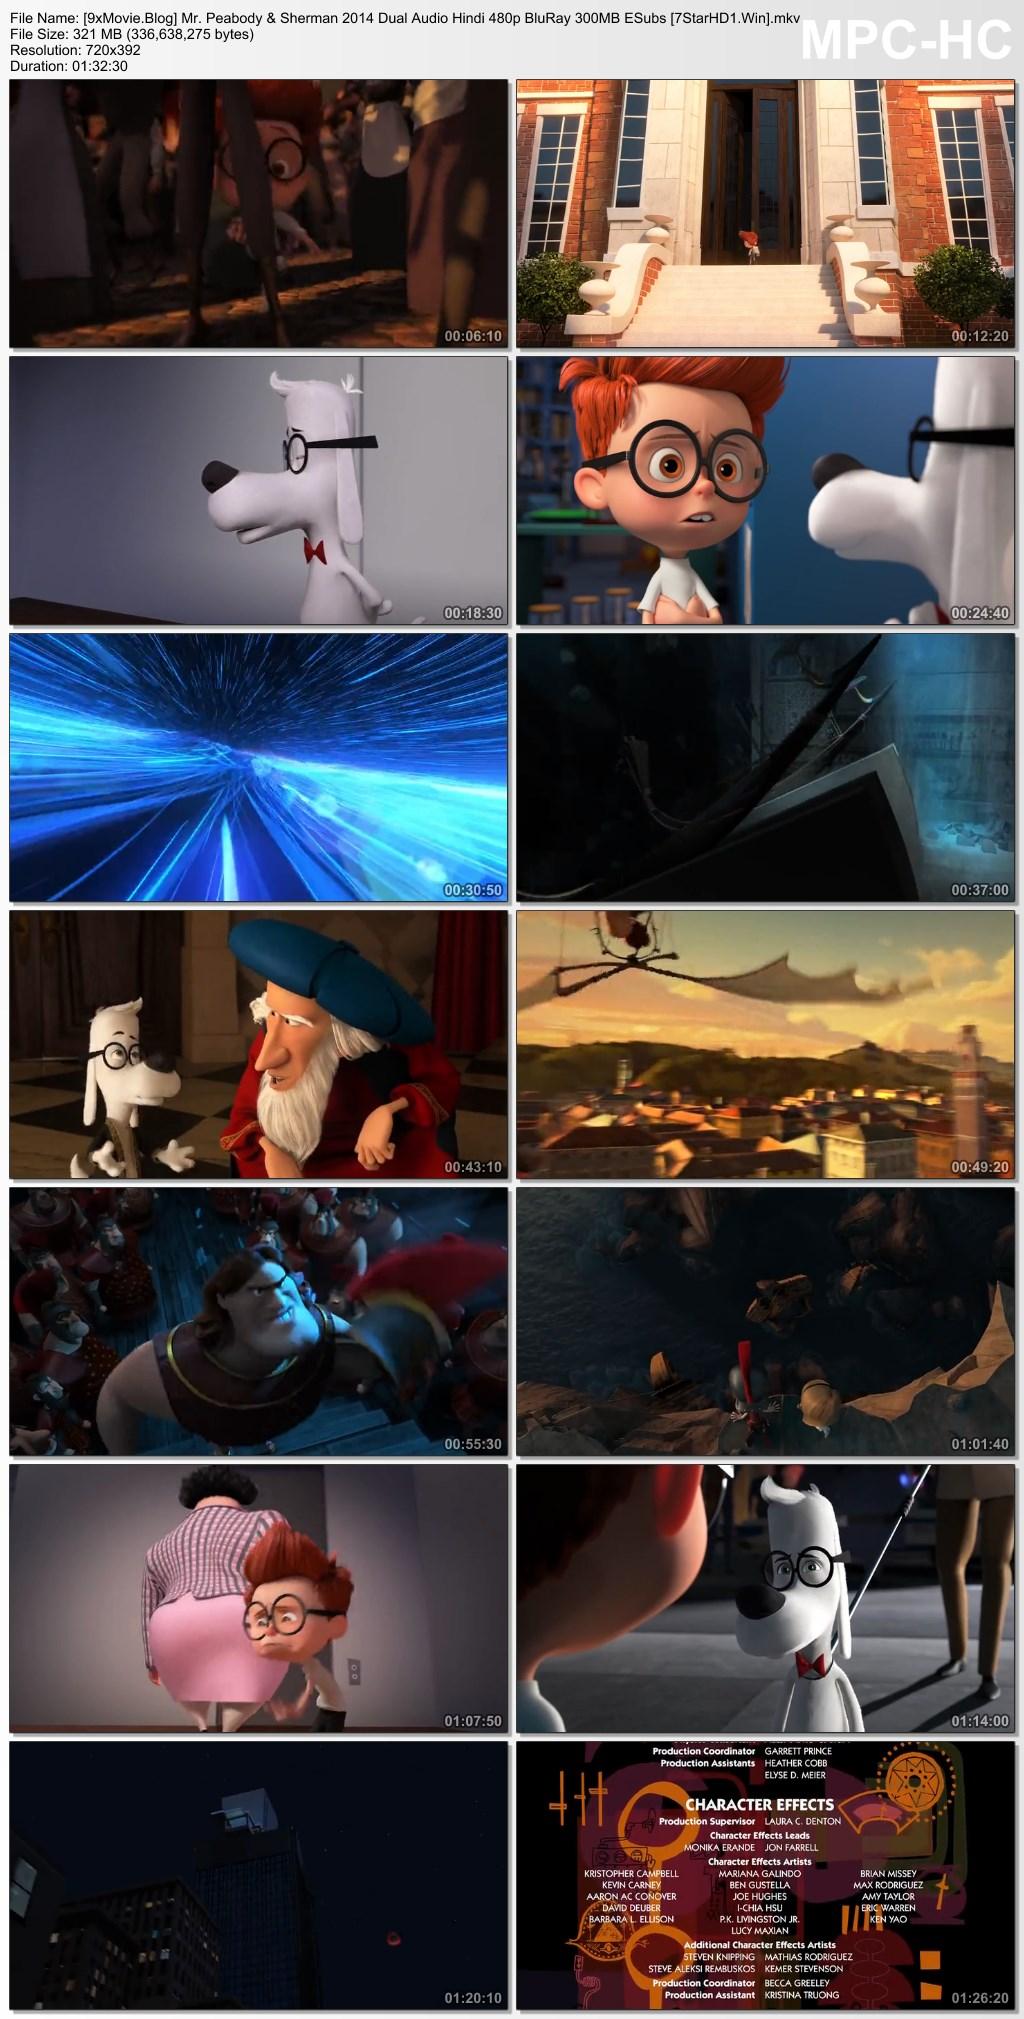 Mr. Peabody & Sherman 2014 Dual Audio Hindi 480p BluRay x264 300MB ESubs